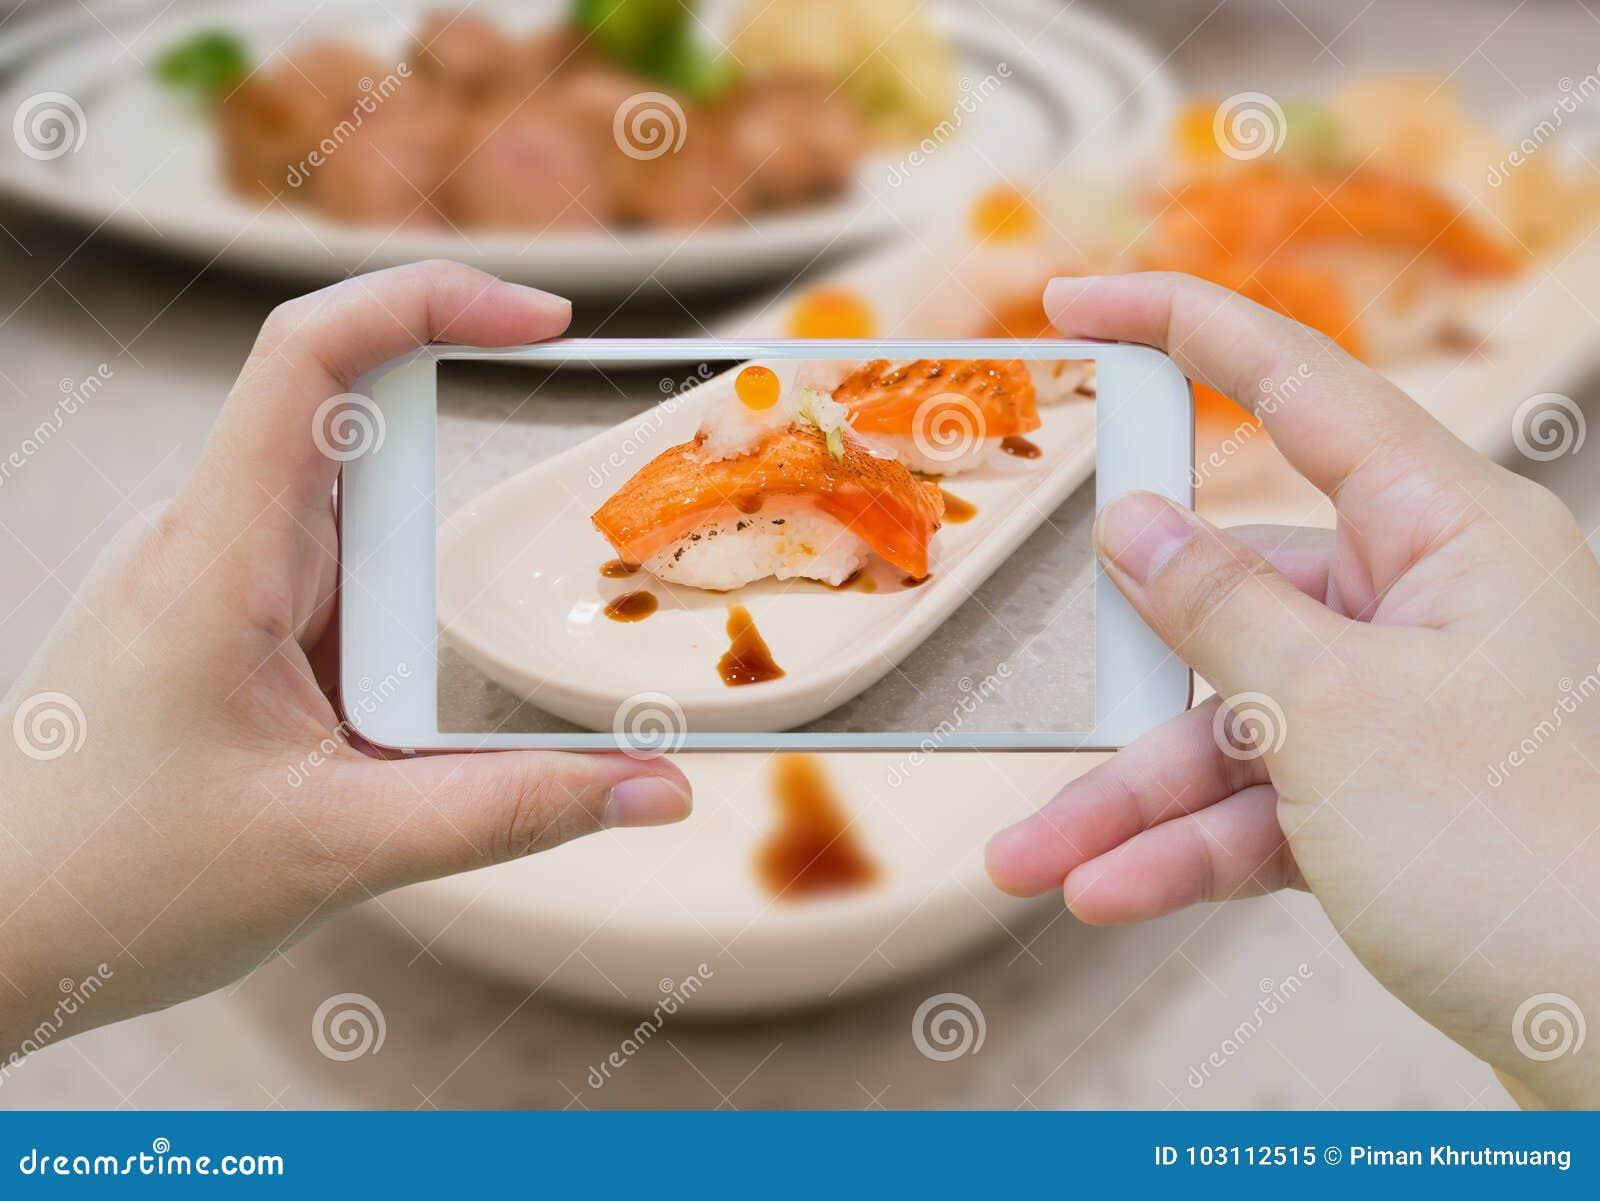 Taking photo of Grilled salmon sushi